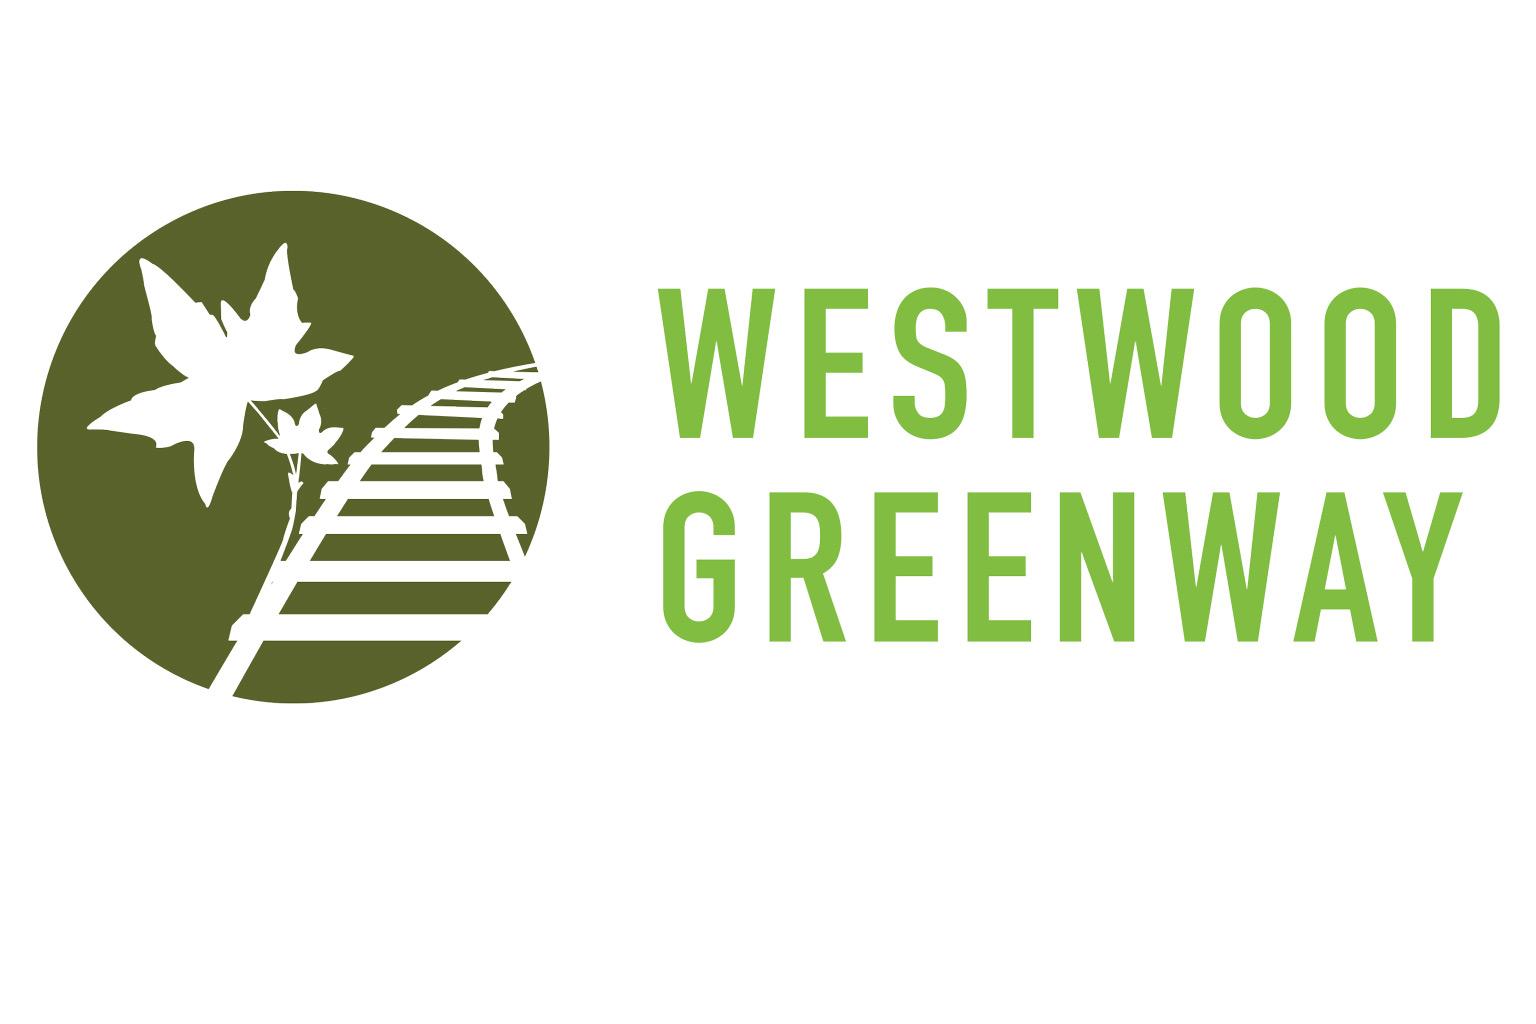 westwood-greenway